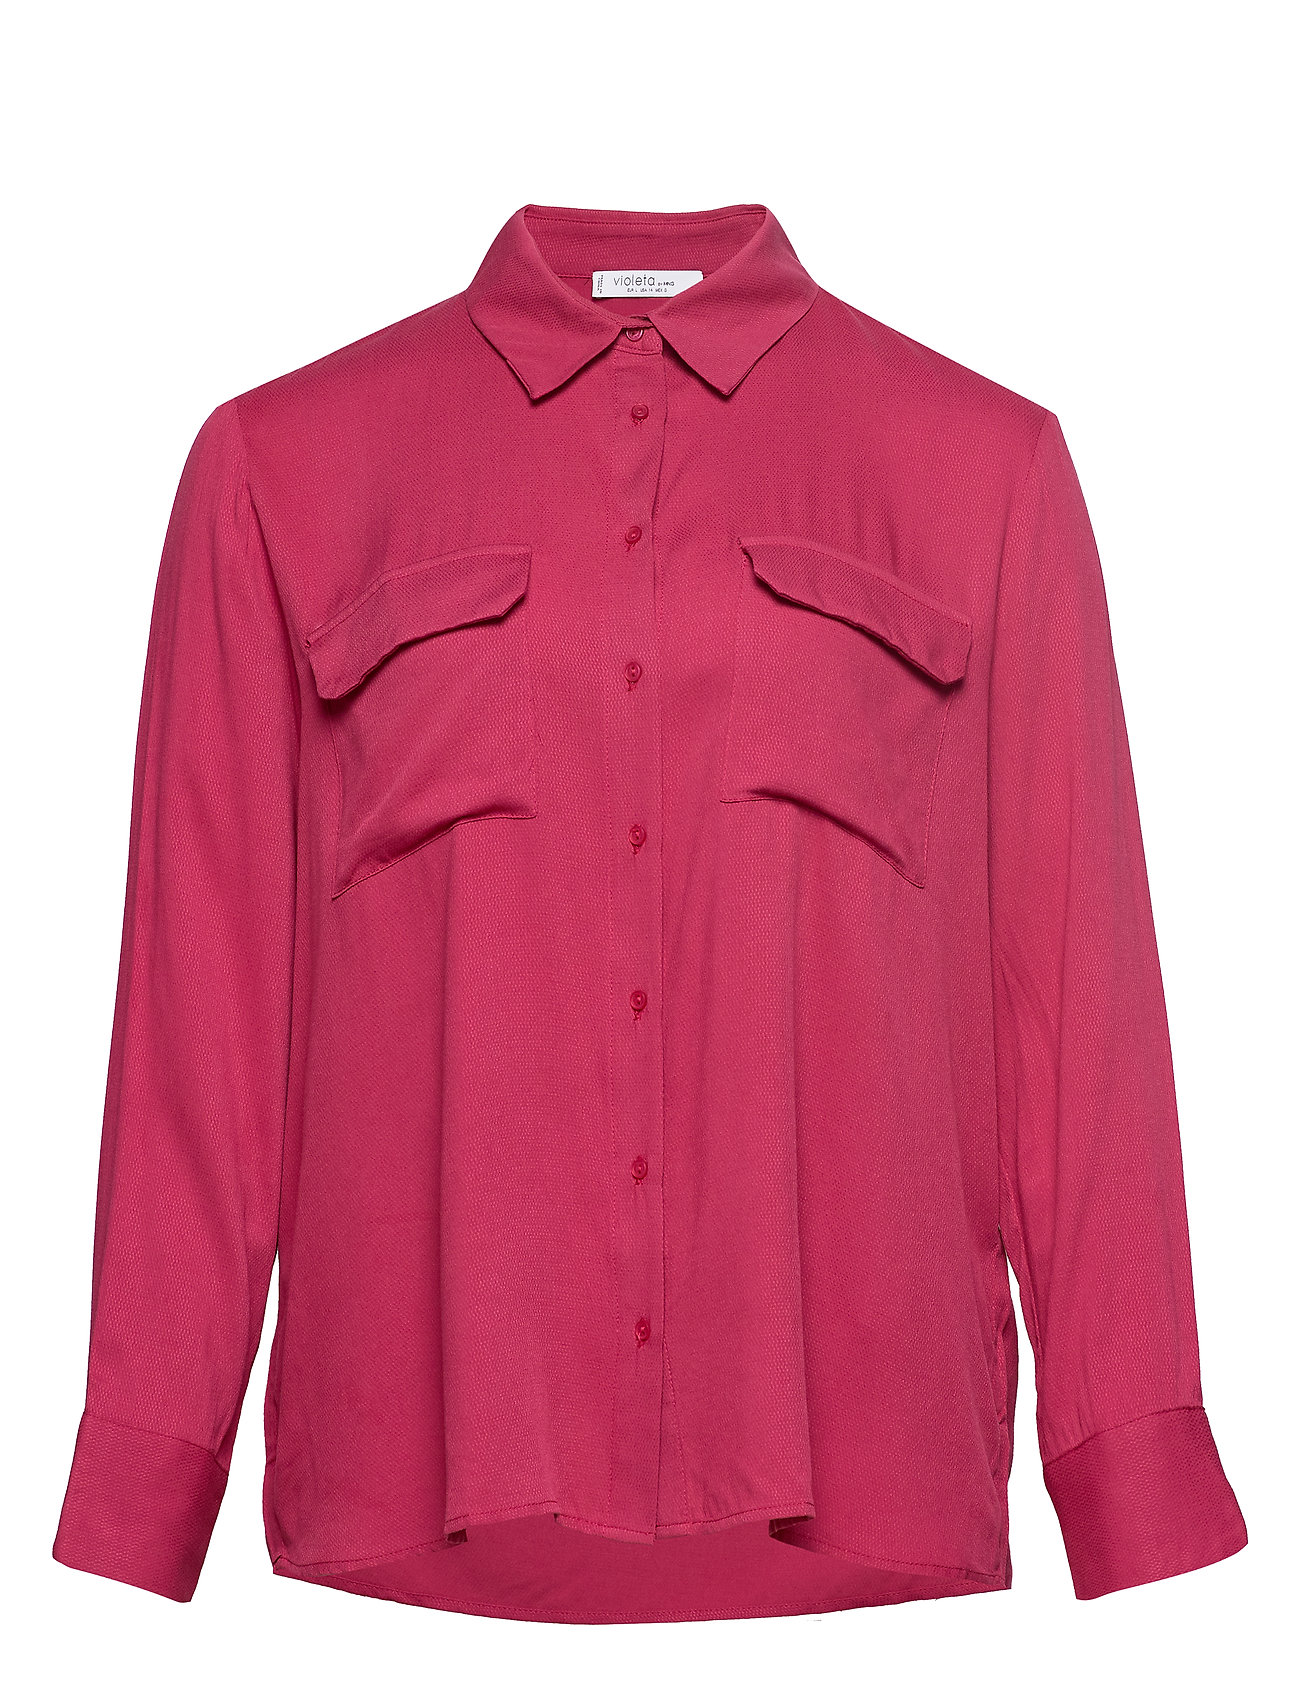 Violeta by Mango Flap pocketed shirt - DARK RED